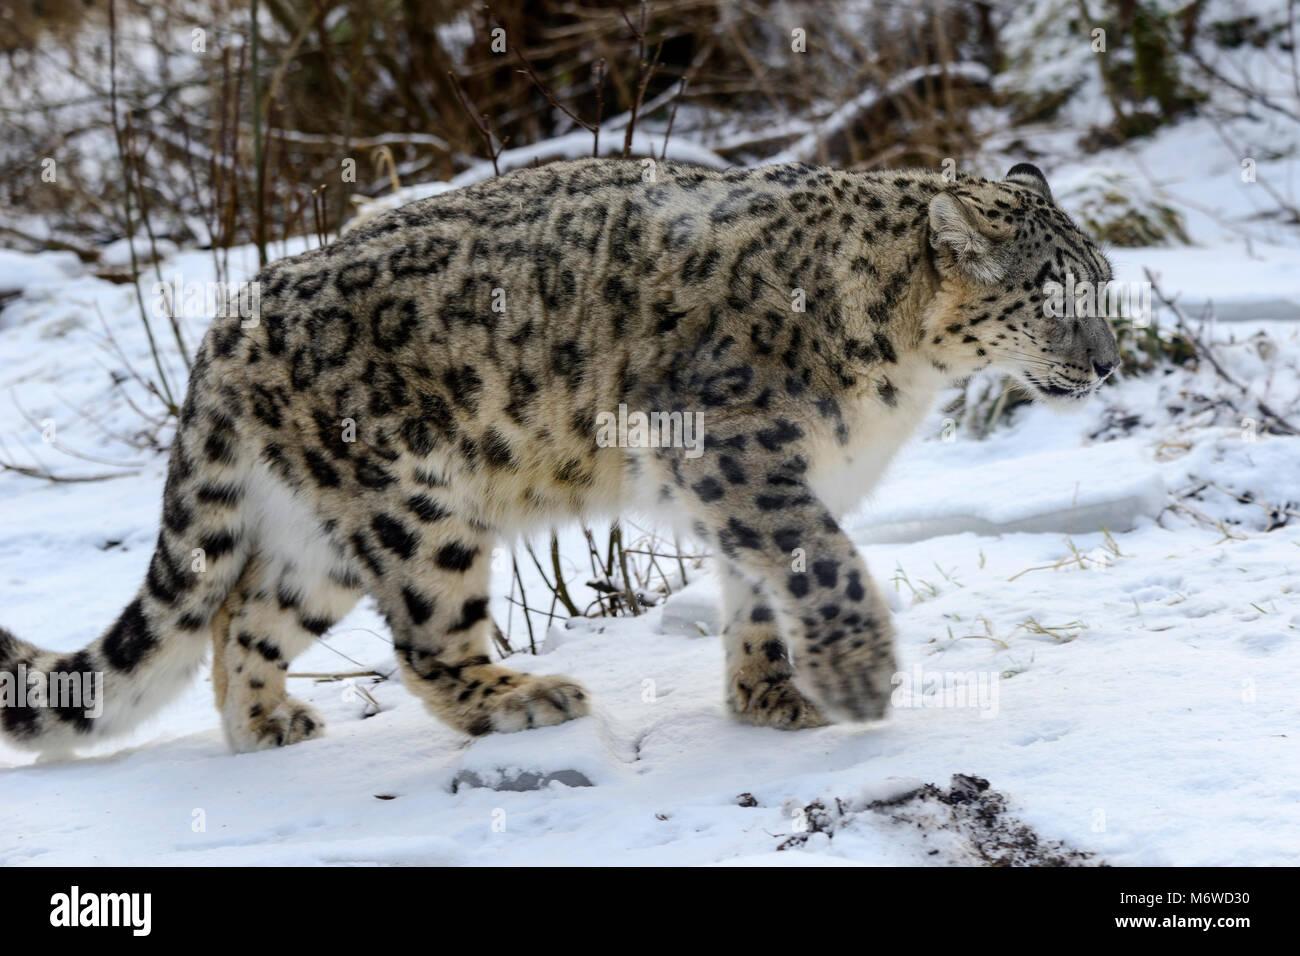 Captive snow leopard (Panthera uncia) bei Highland Wildlife Park Kincraig, Kingussie, Schottland, UK Stockbild